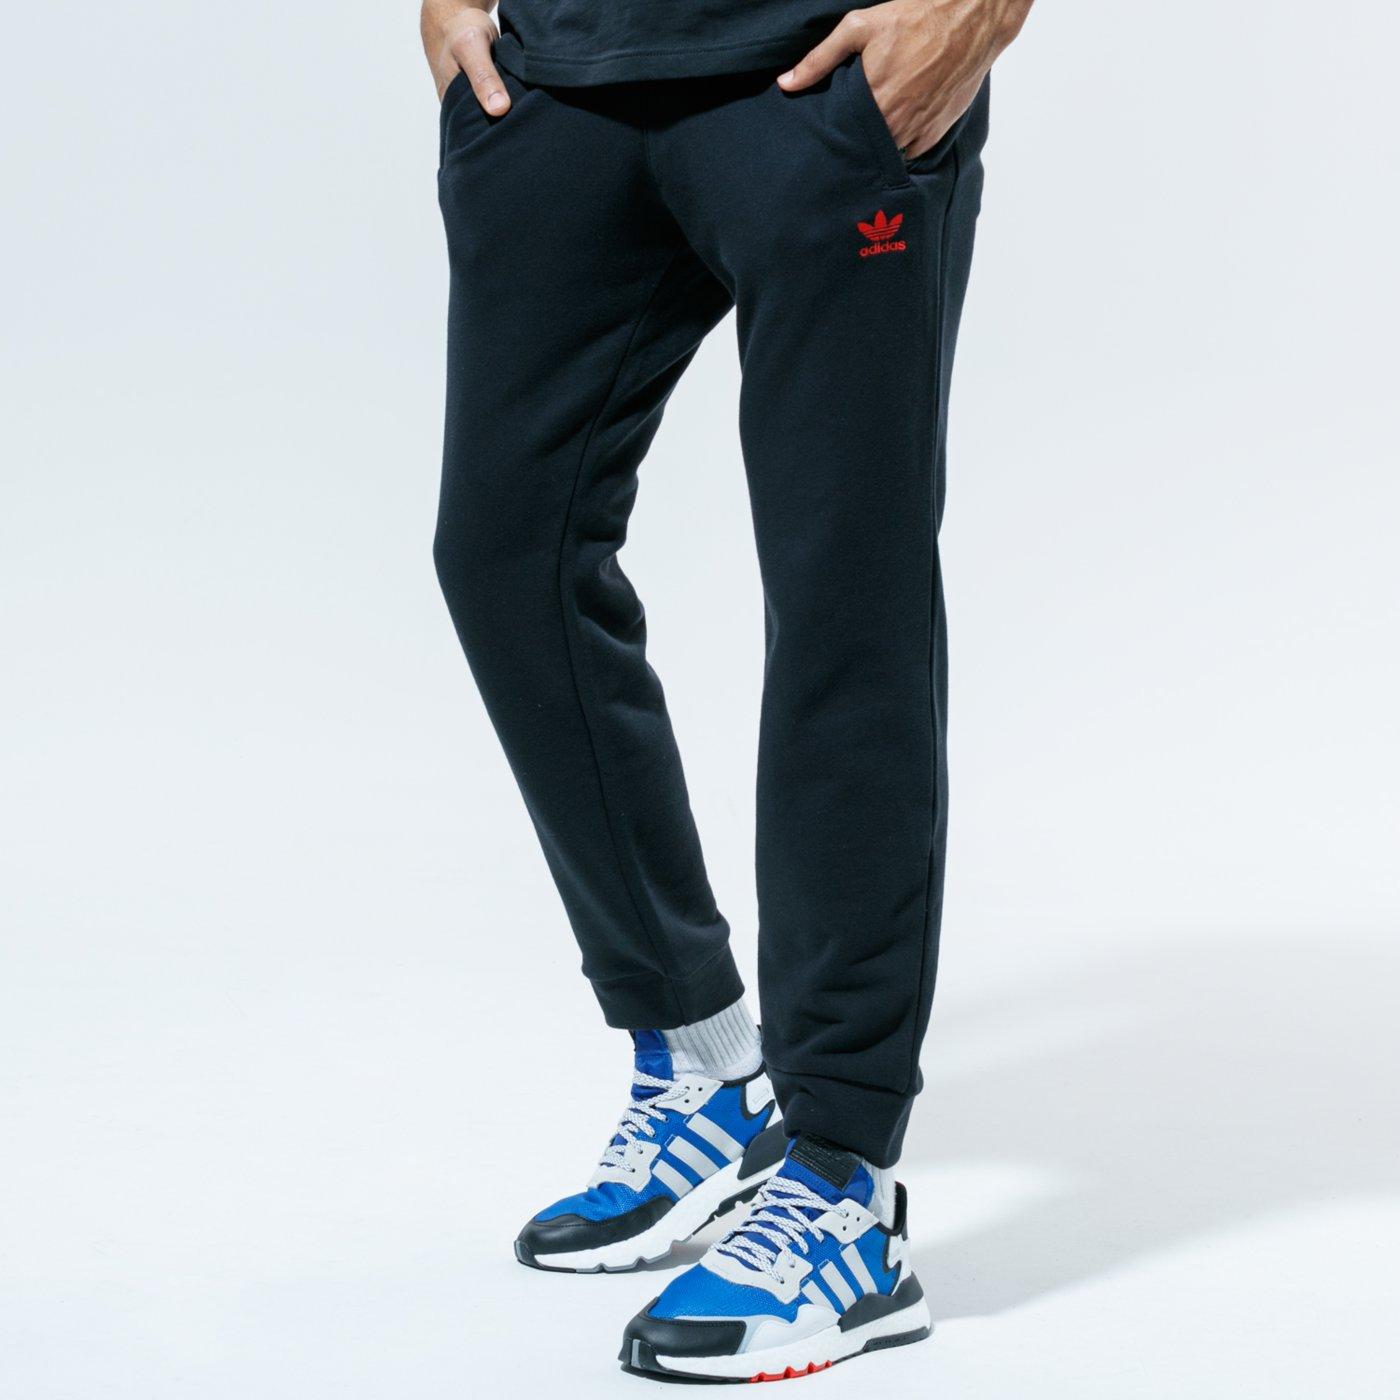 Adidas tepláky Trefoil Pant black Velikost: M